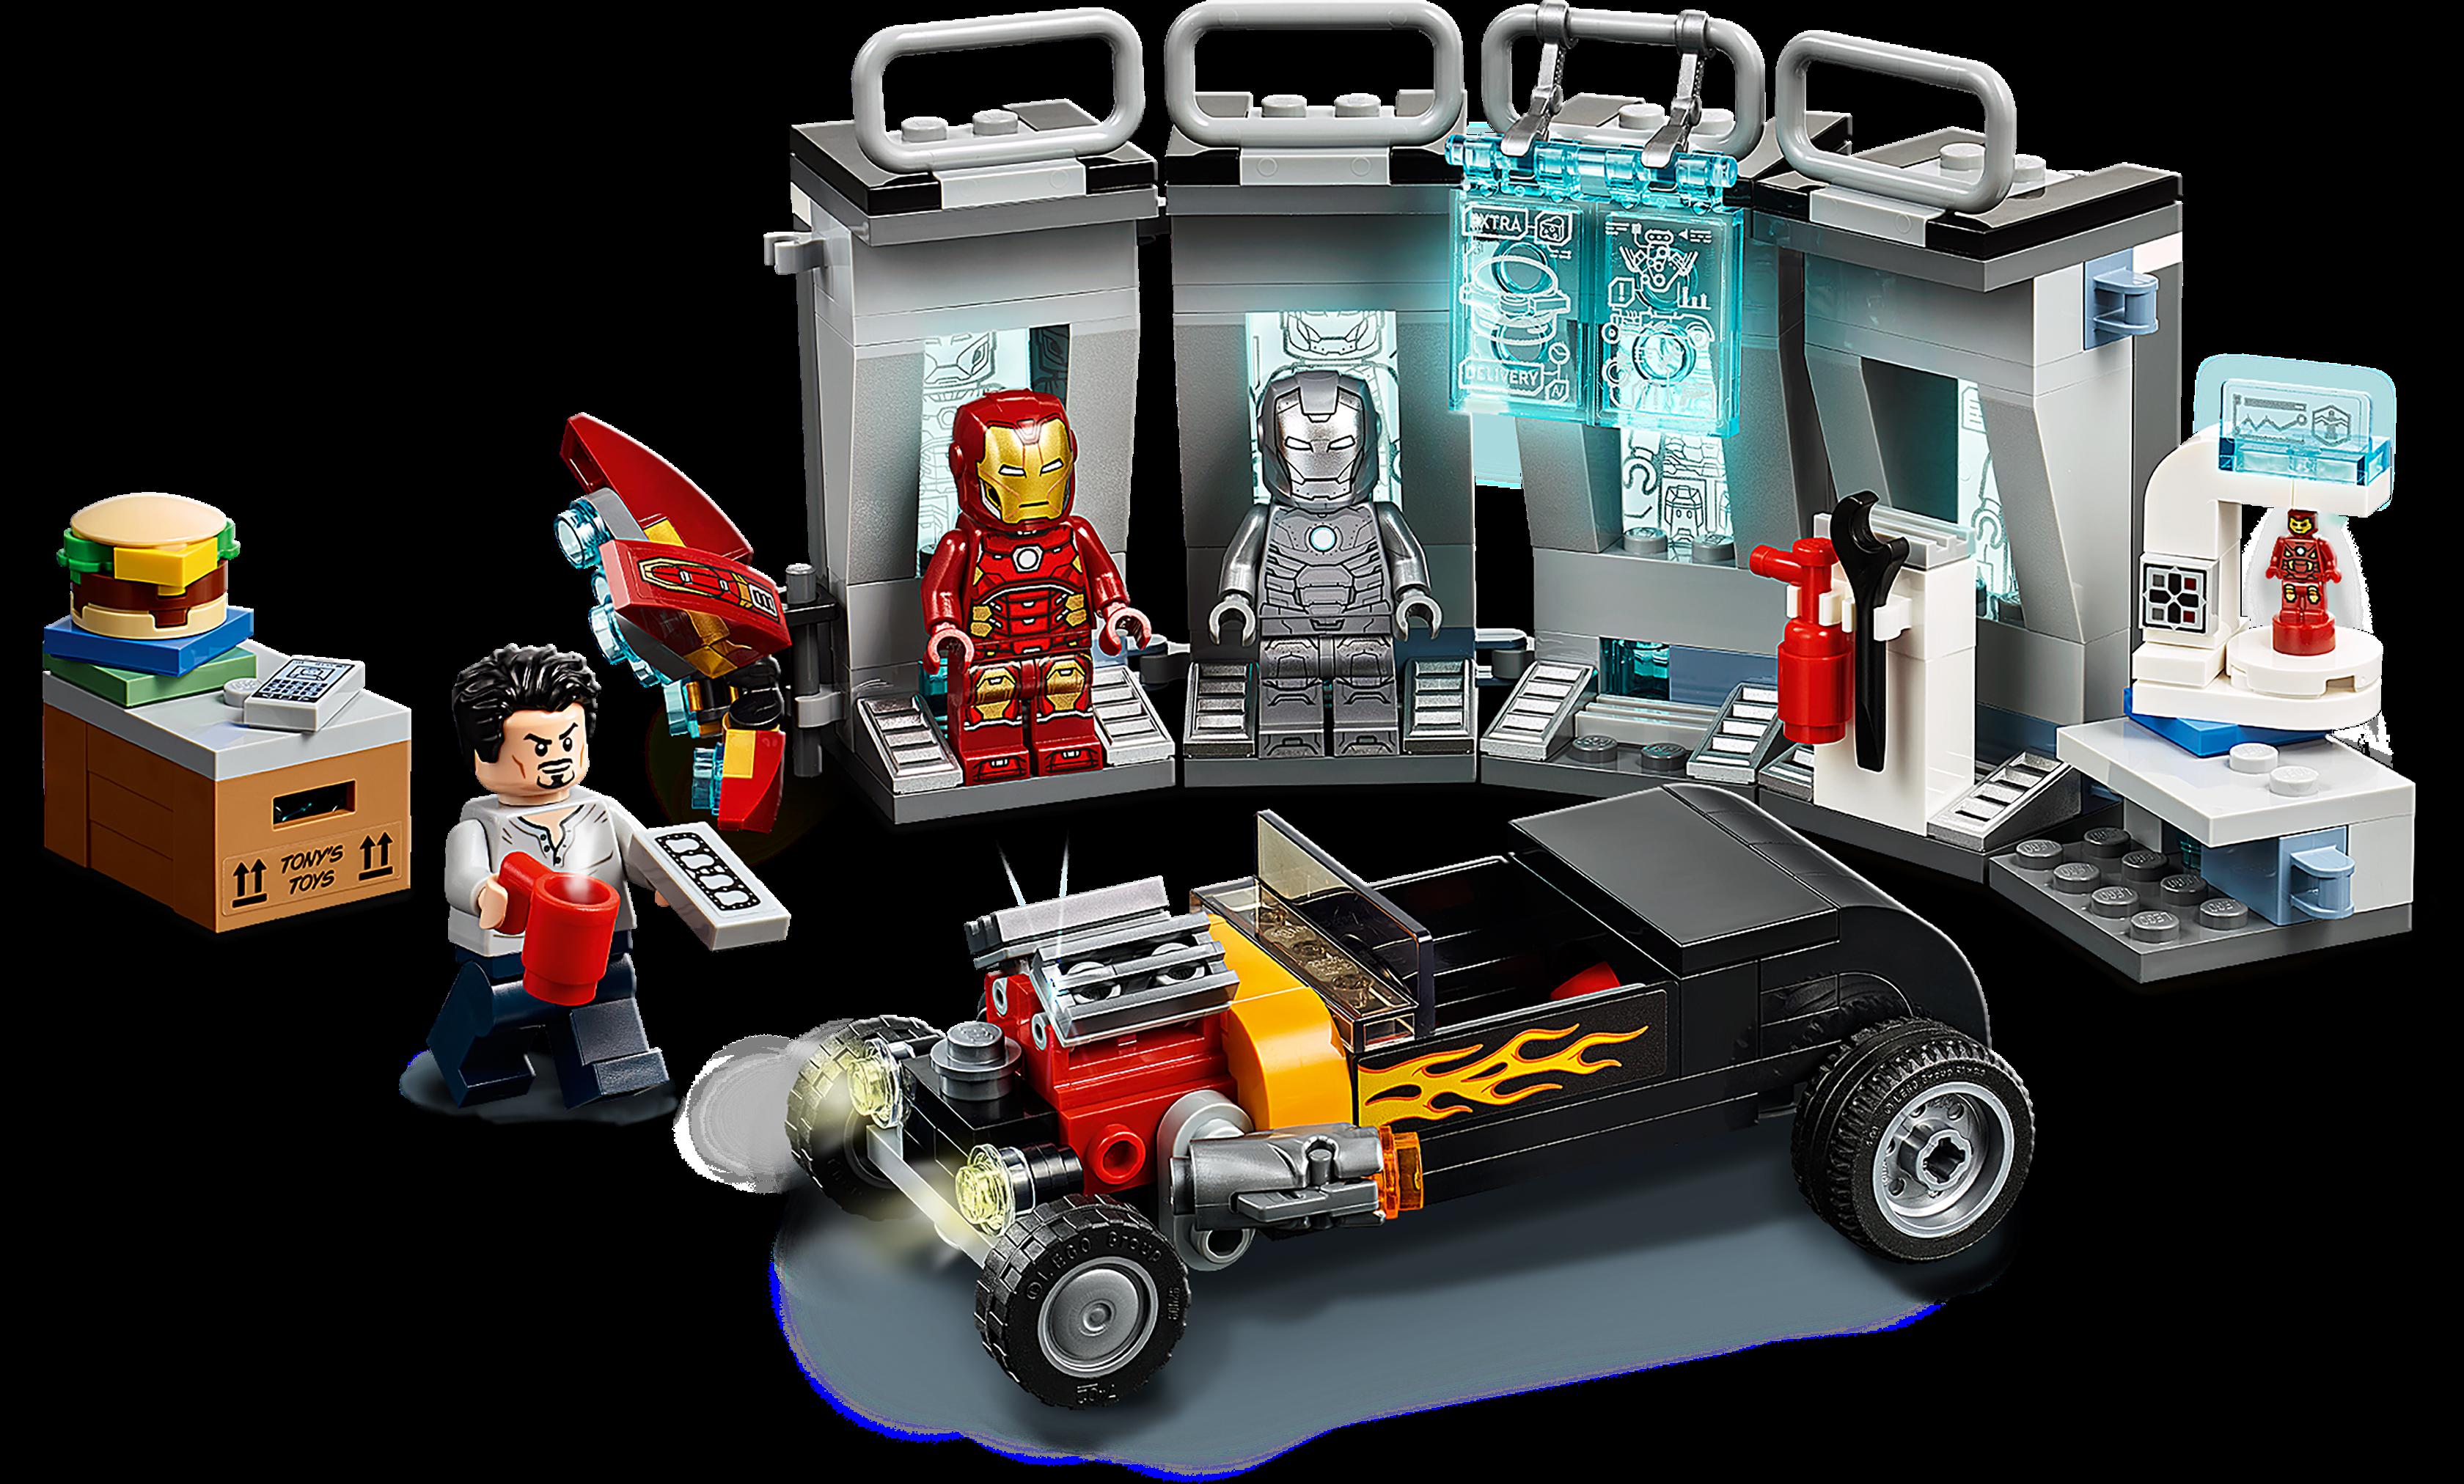 Ironman WARMASCHINE Roady Tony Stark Avengers Endgame komplett Lego kompatibel